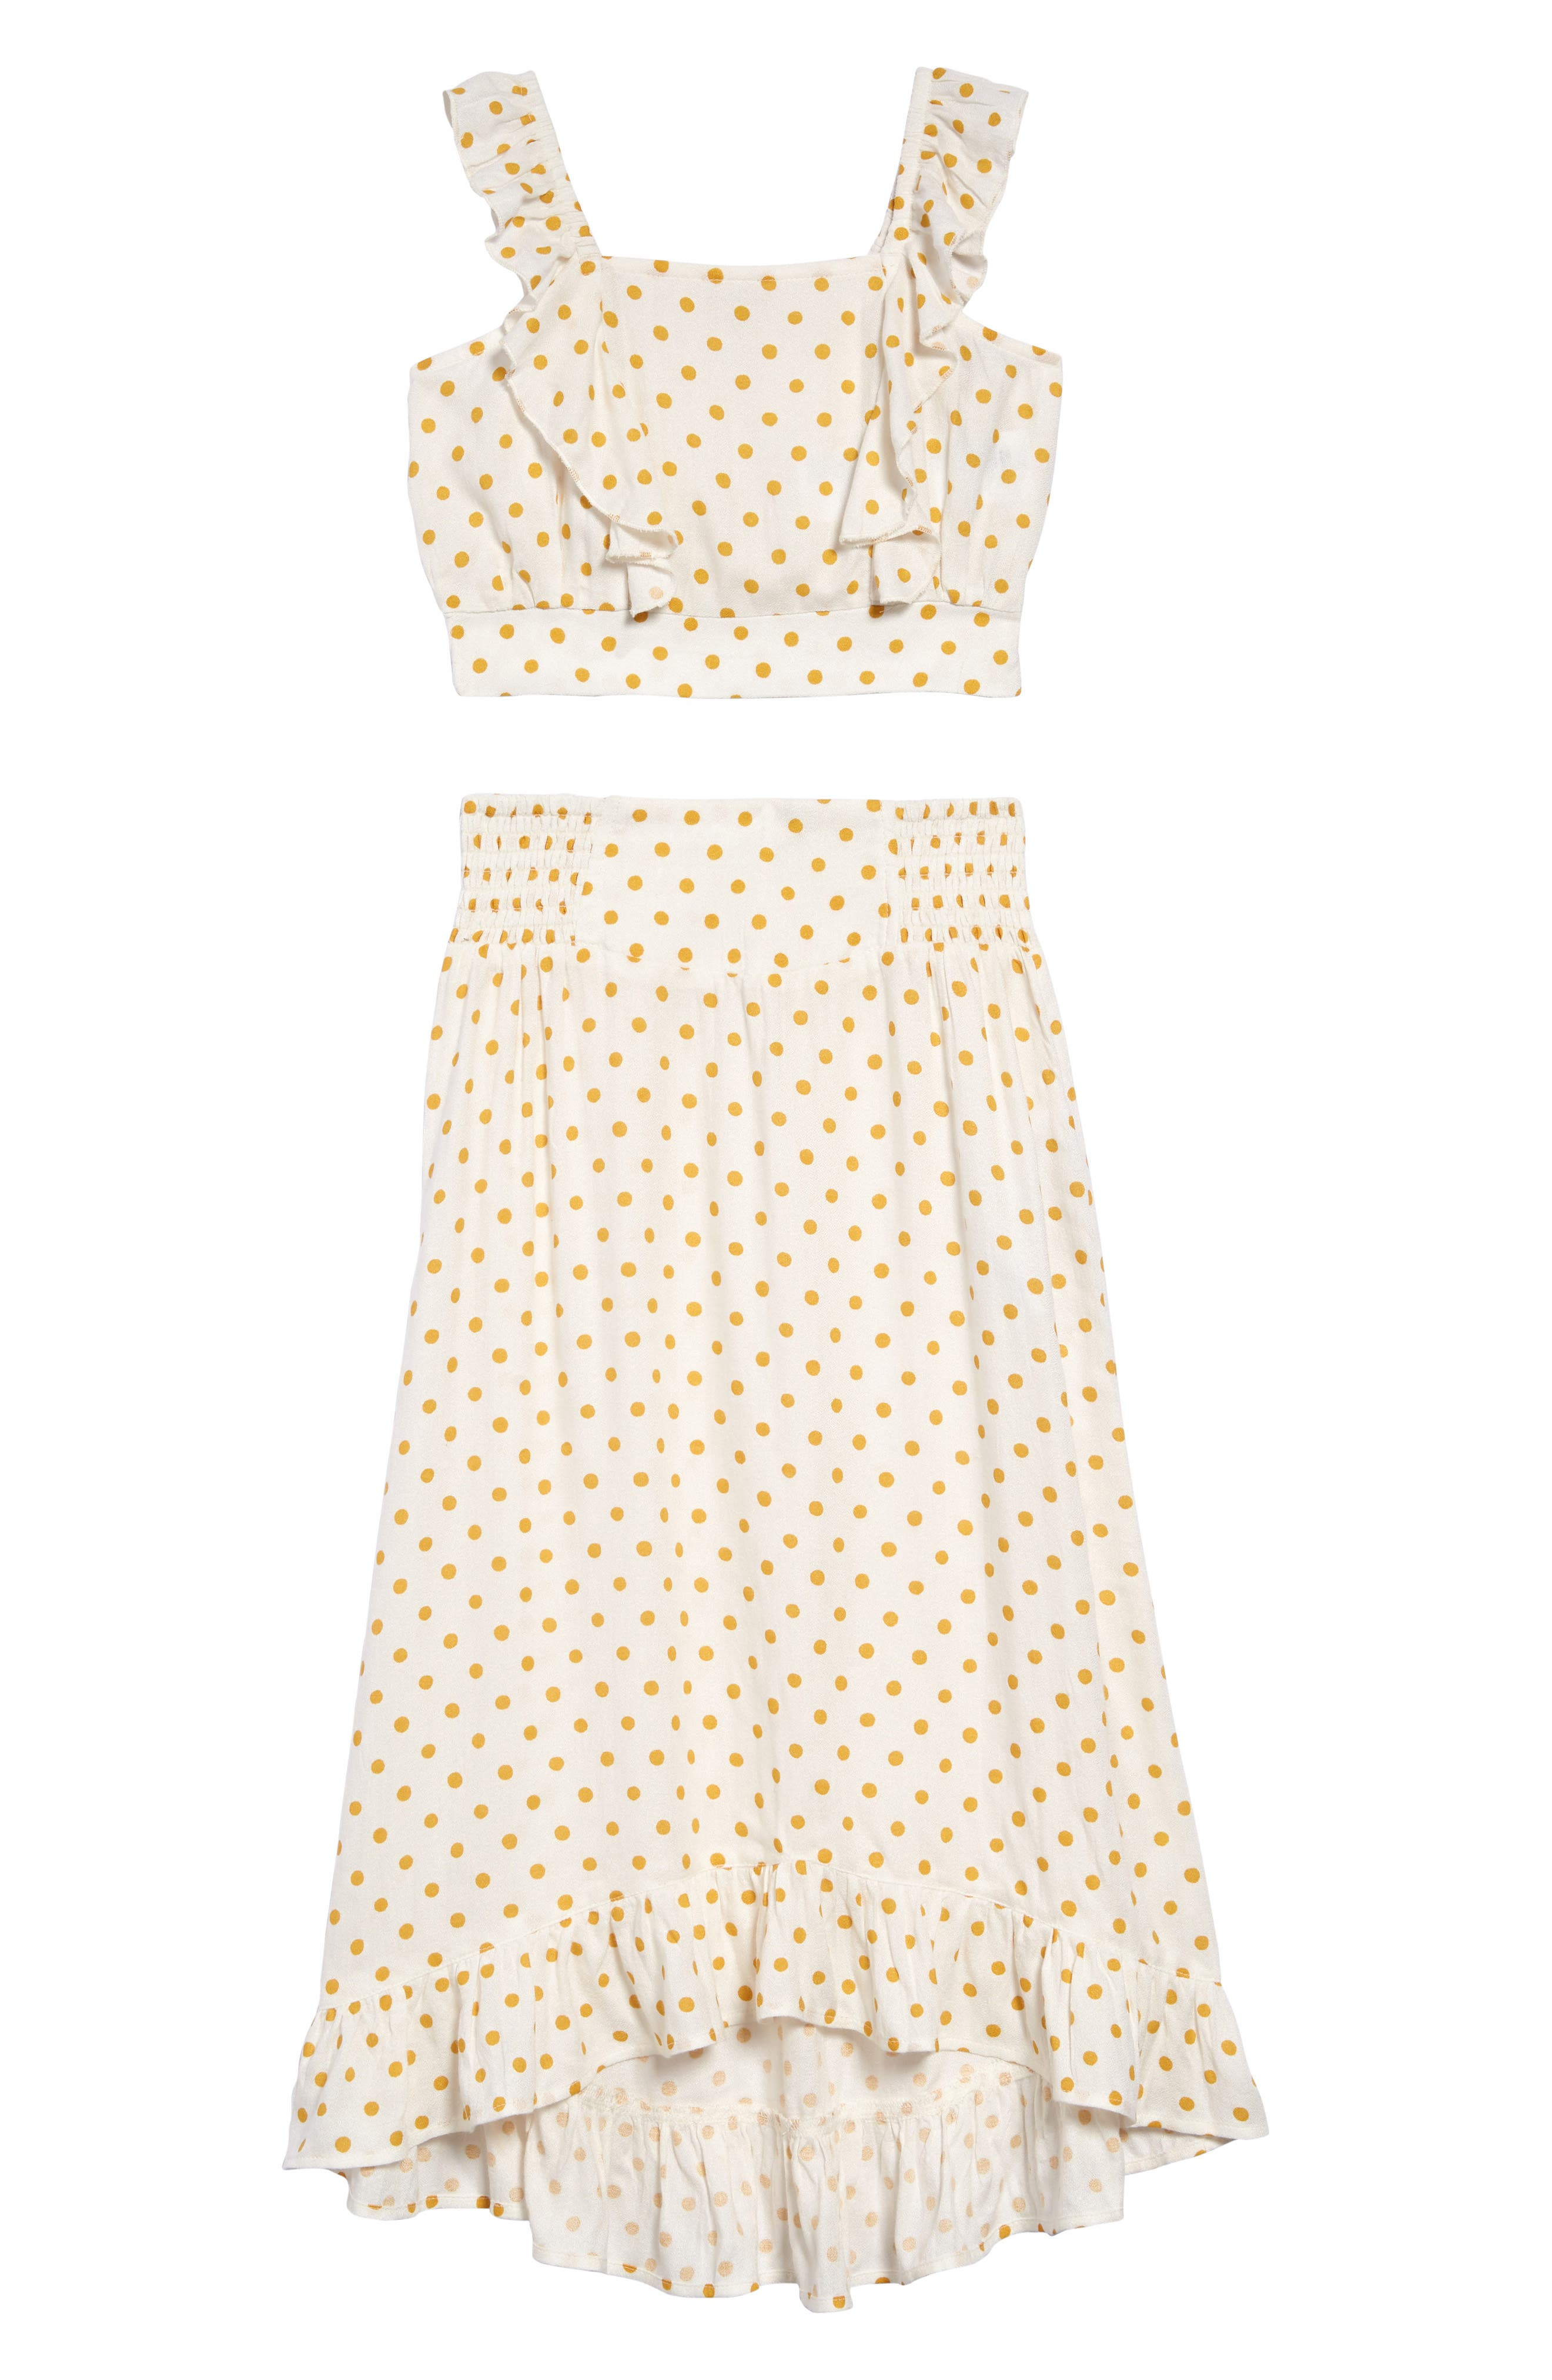 Girls Billabong Paired Up Polka Dot Crop Top  Midi Skirt Set Size L (1214)  Ivory